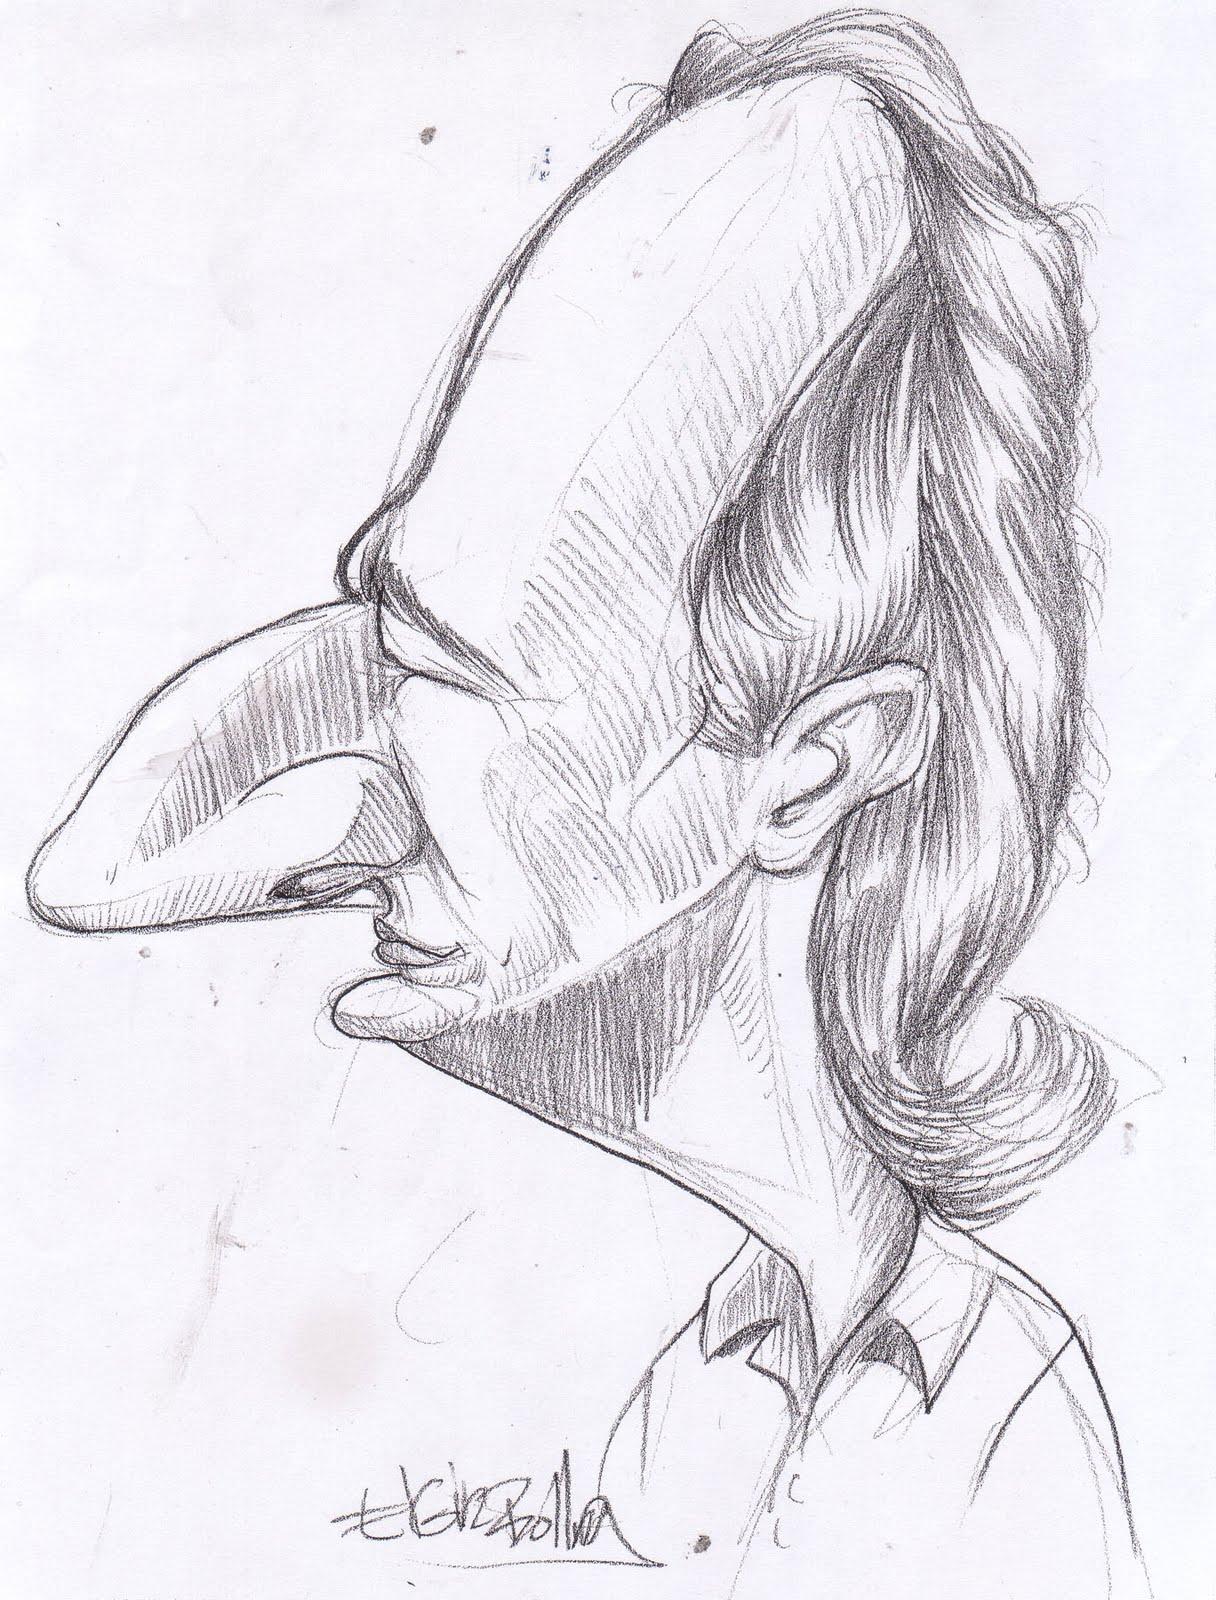 Drawn caricature pencil #3